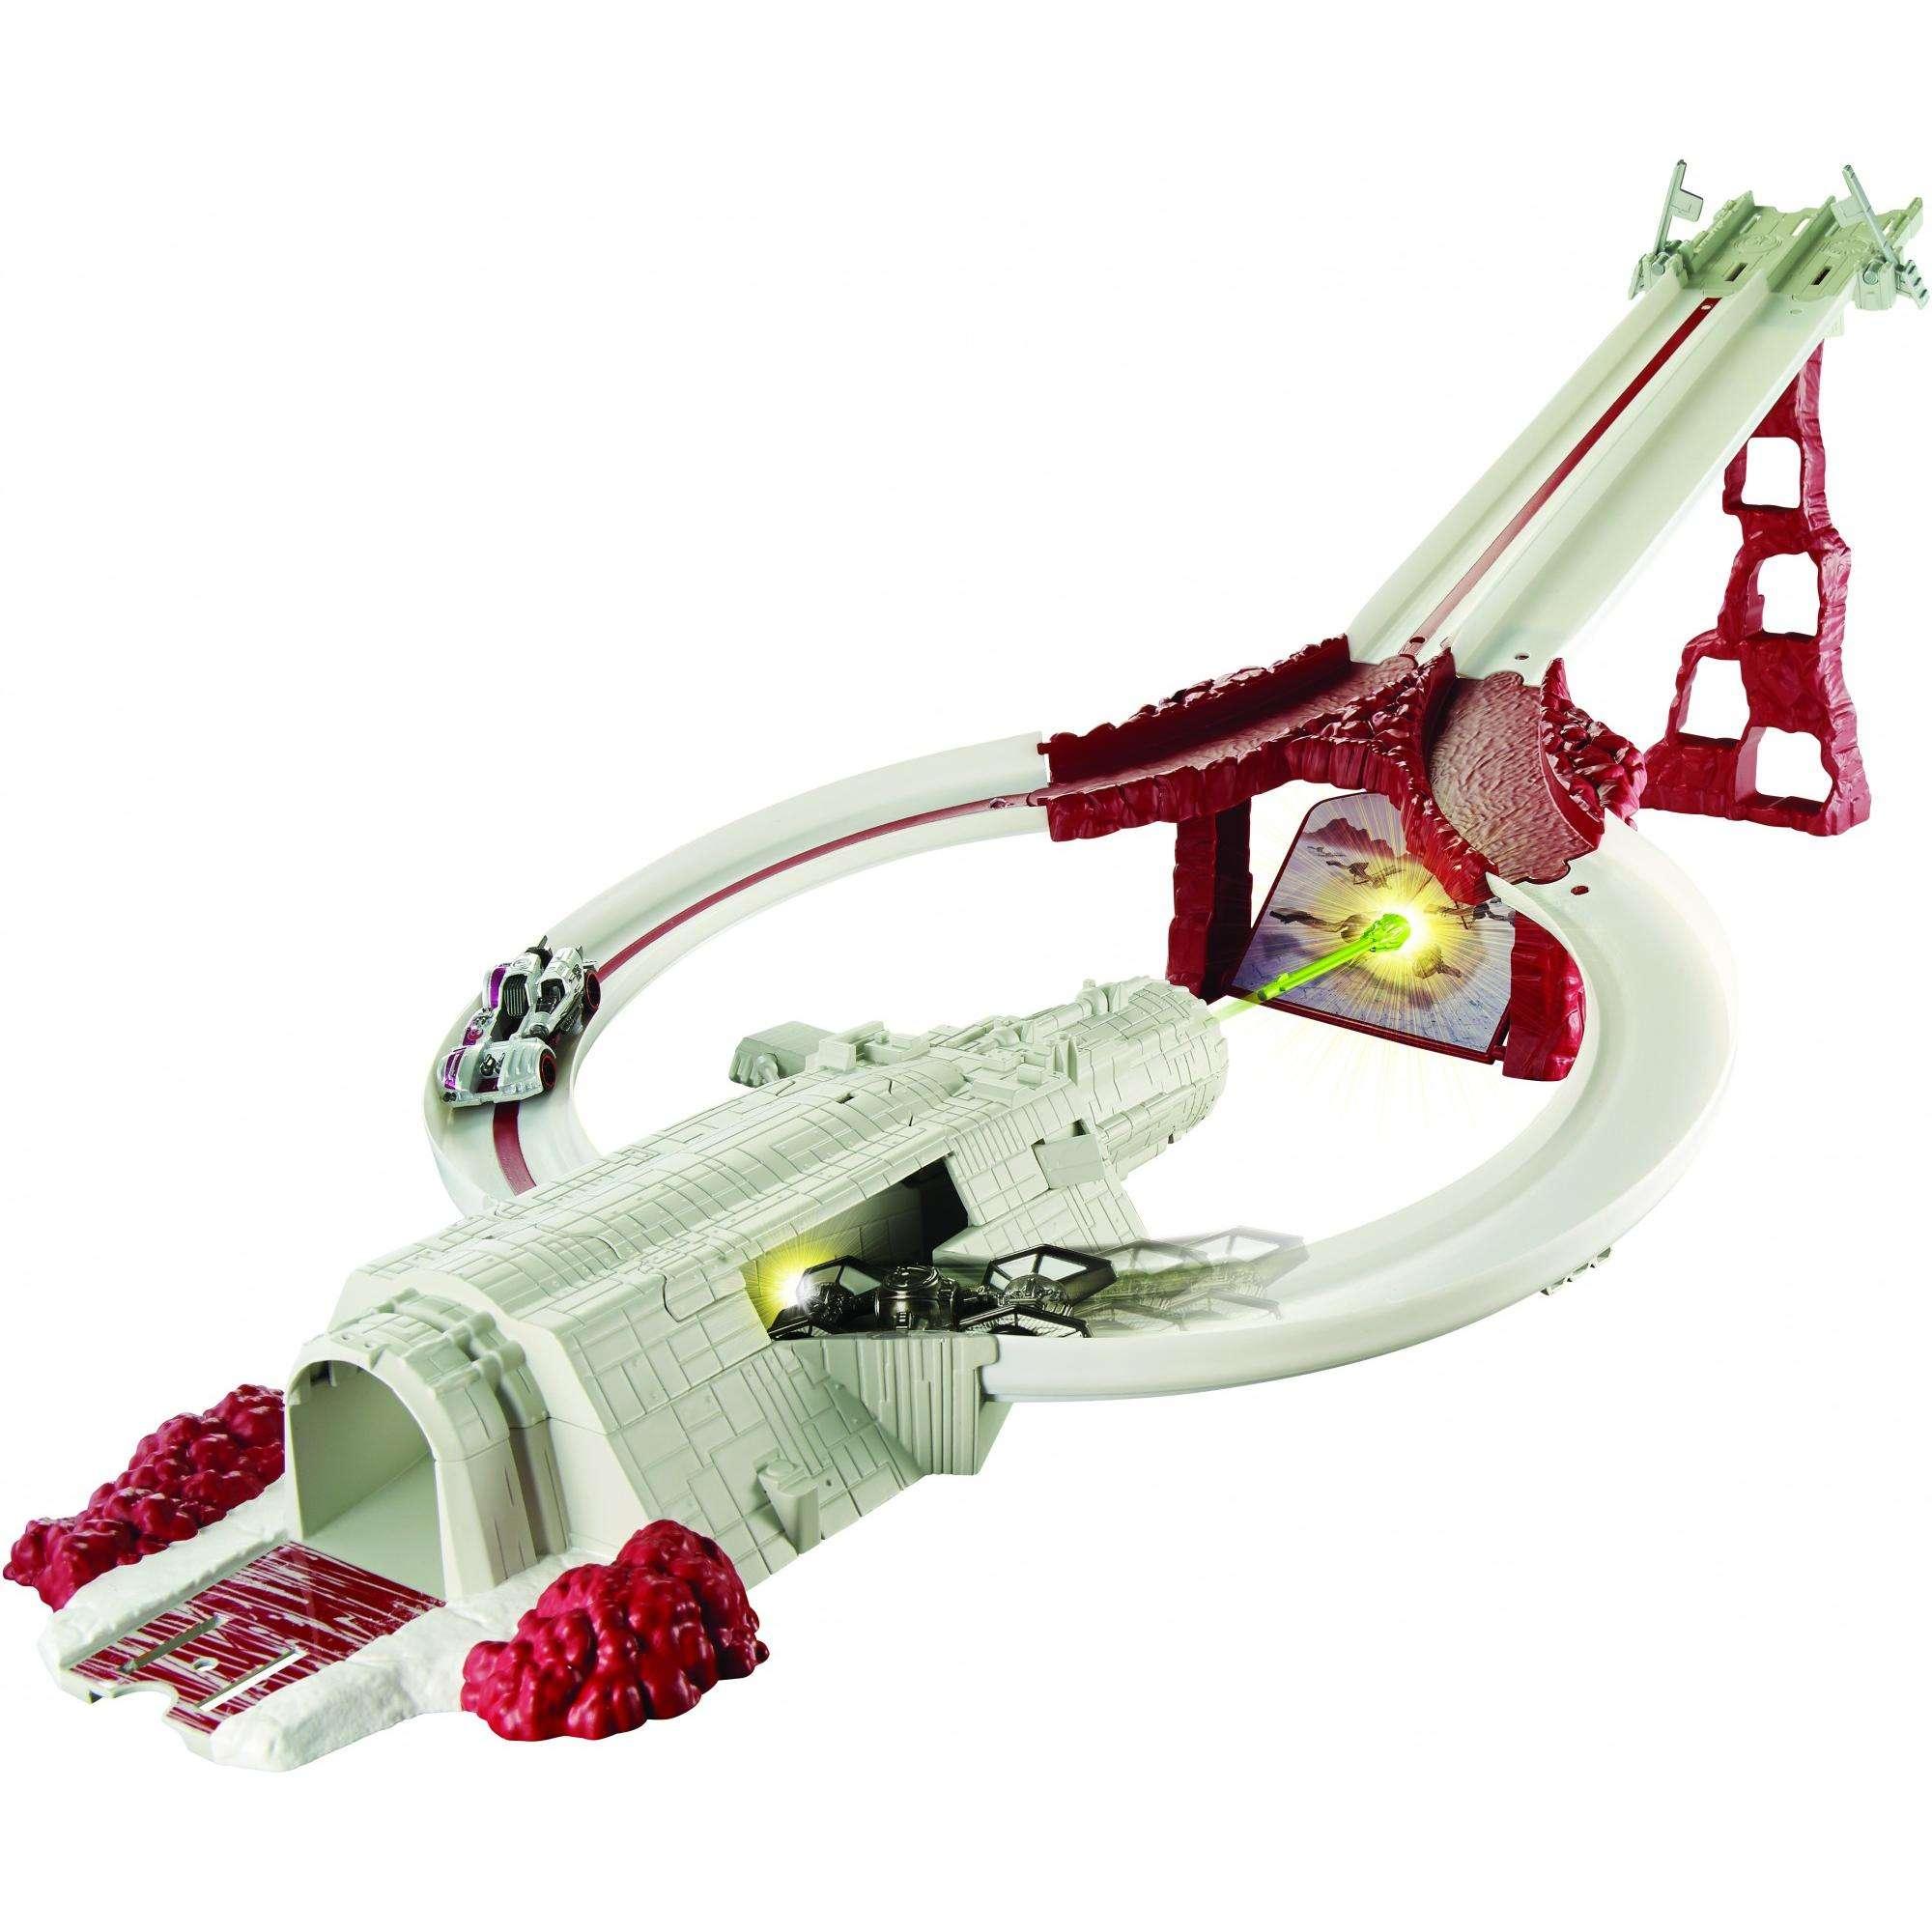 Hot Wheels Star Wars: The Last Jedi Crait Assault Raceway, Track Set by Mattel